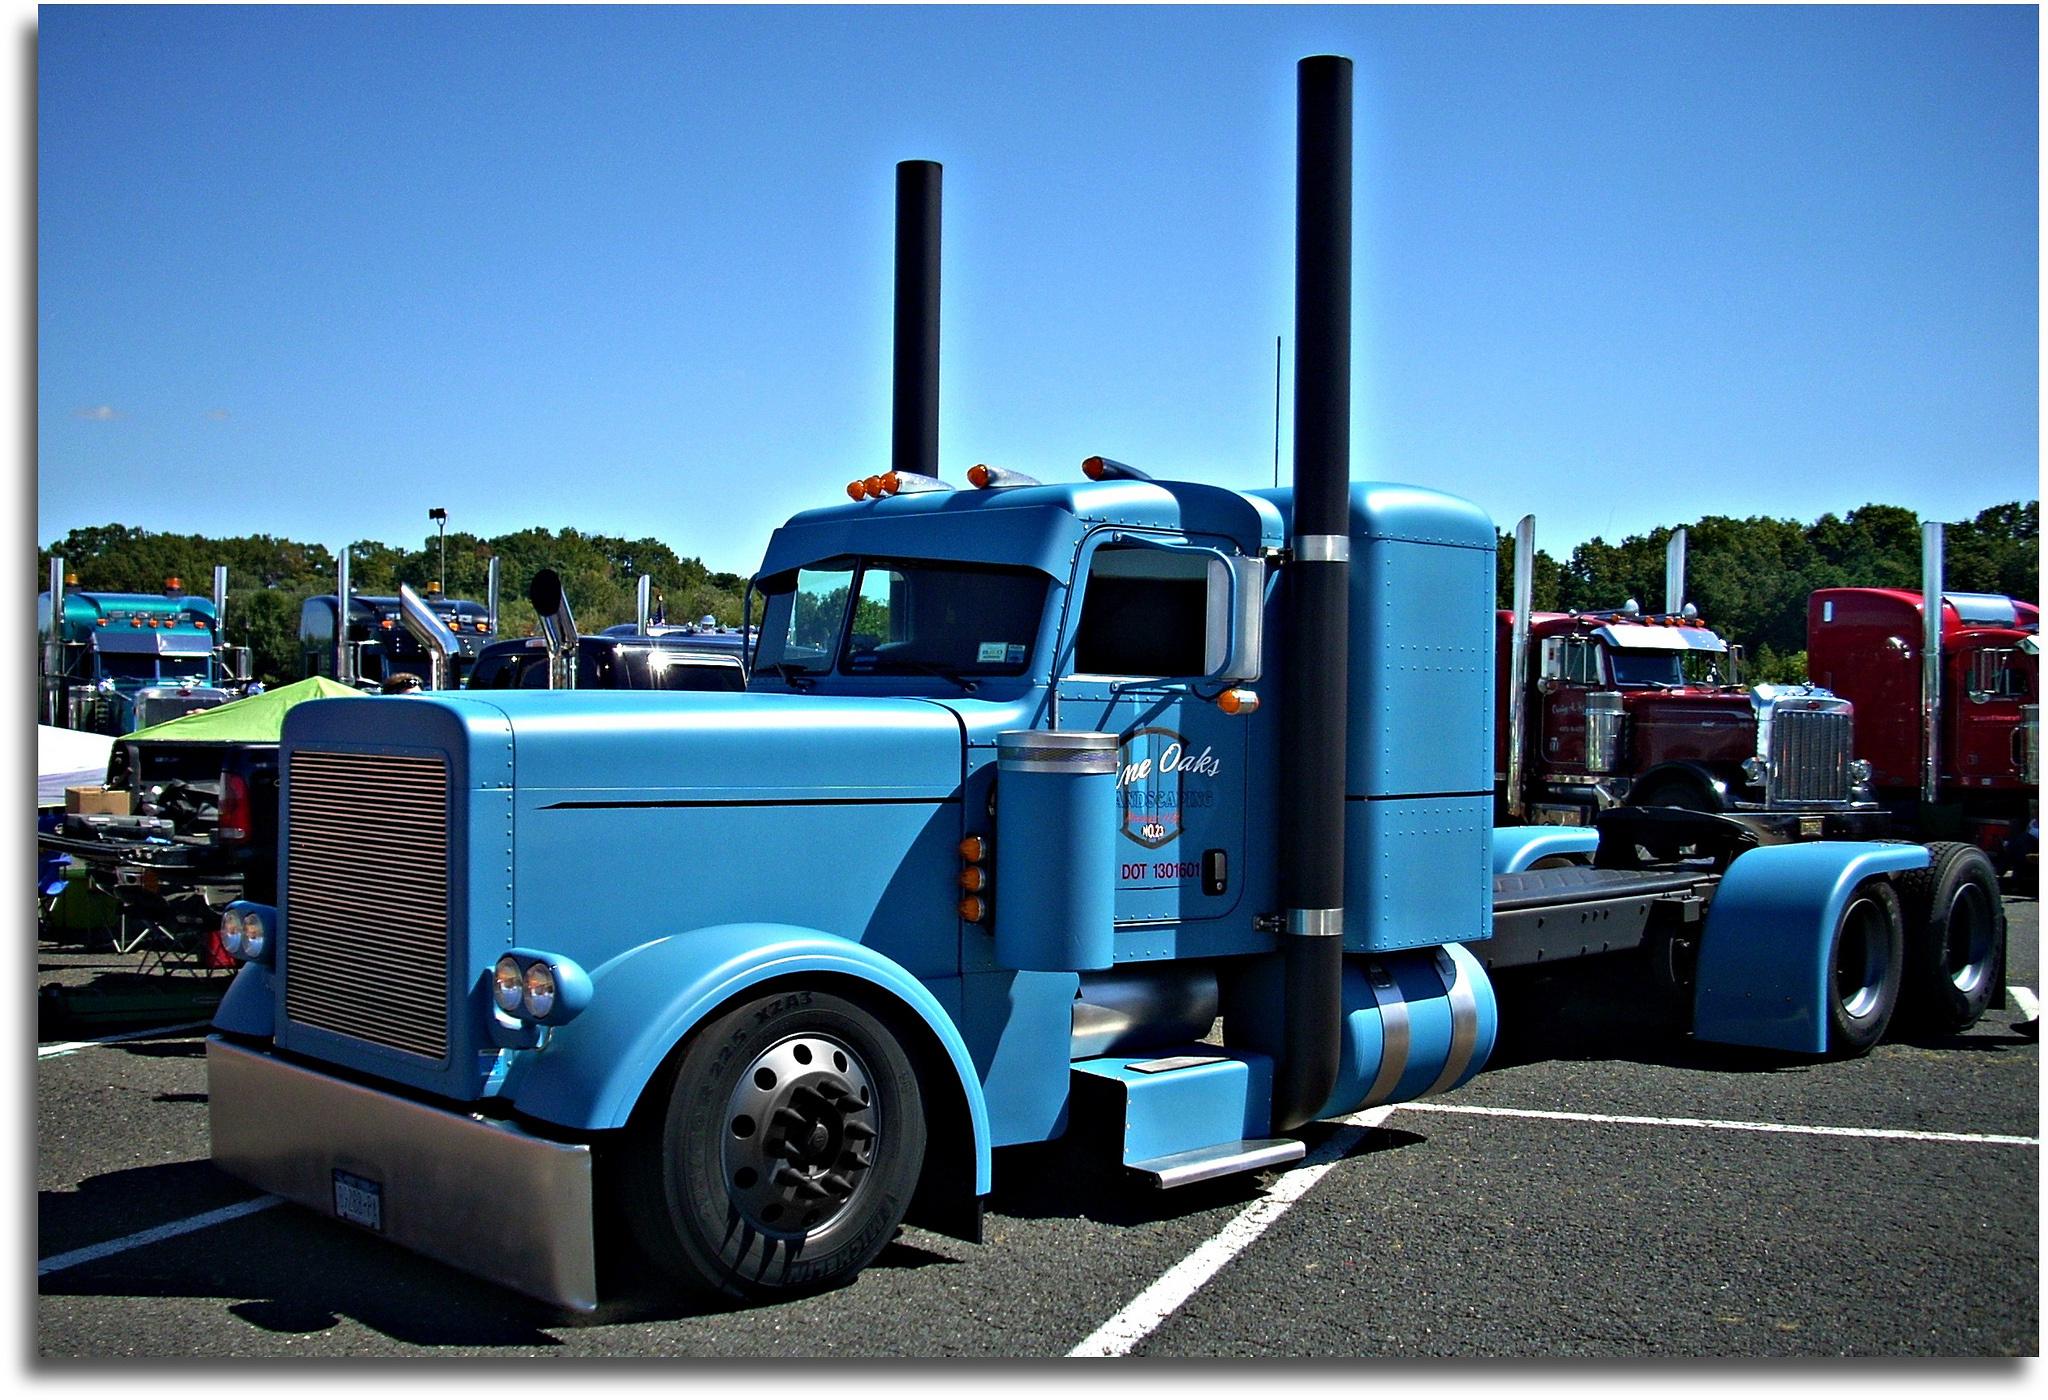 peterbilt truck 359 custom tractor semi rigs rig wallpaper